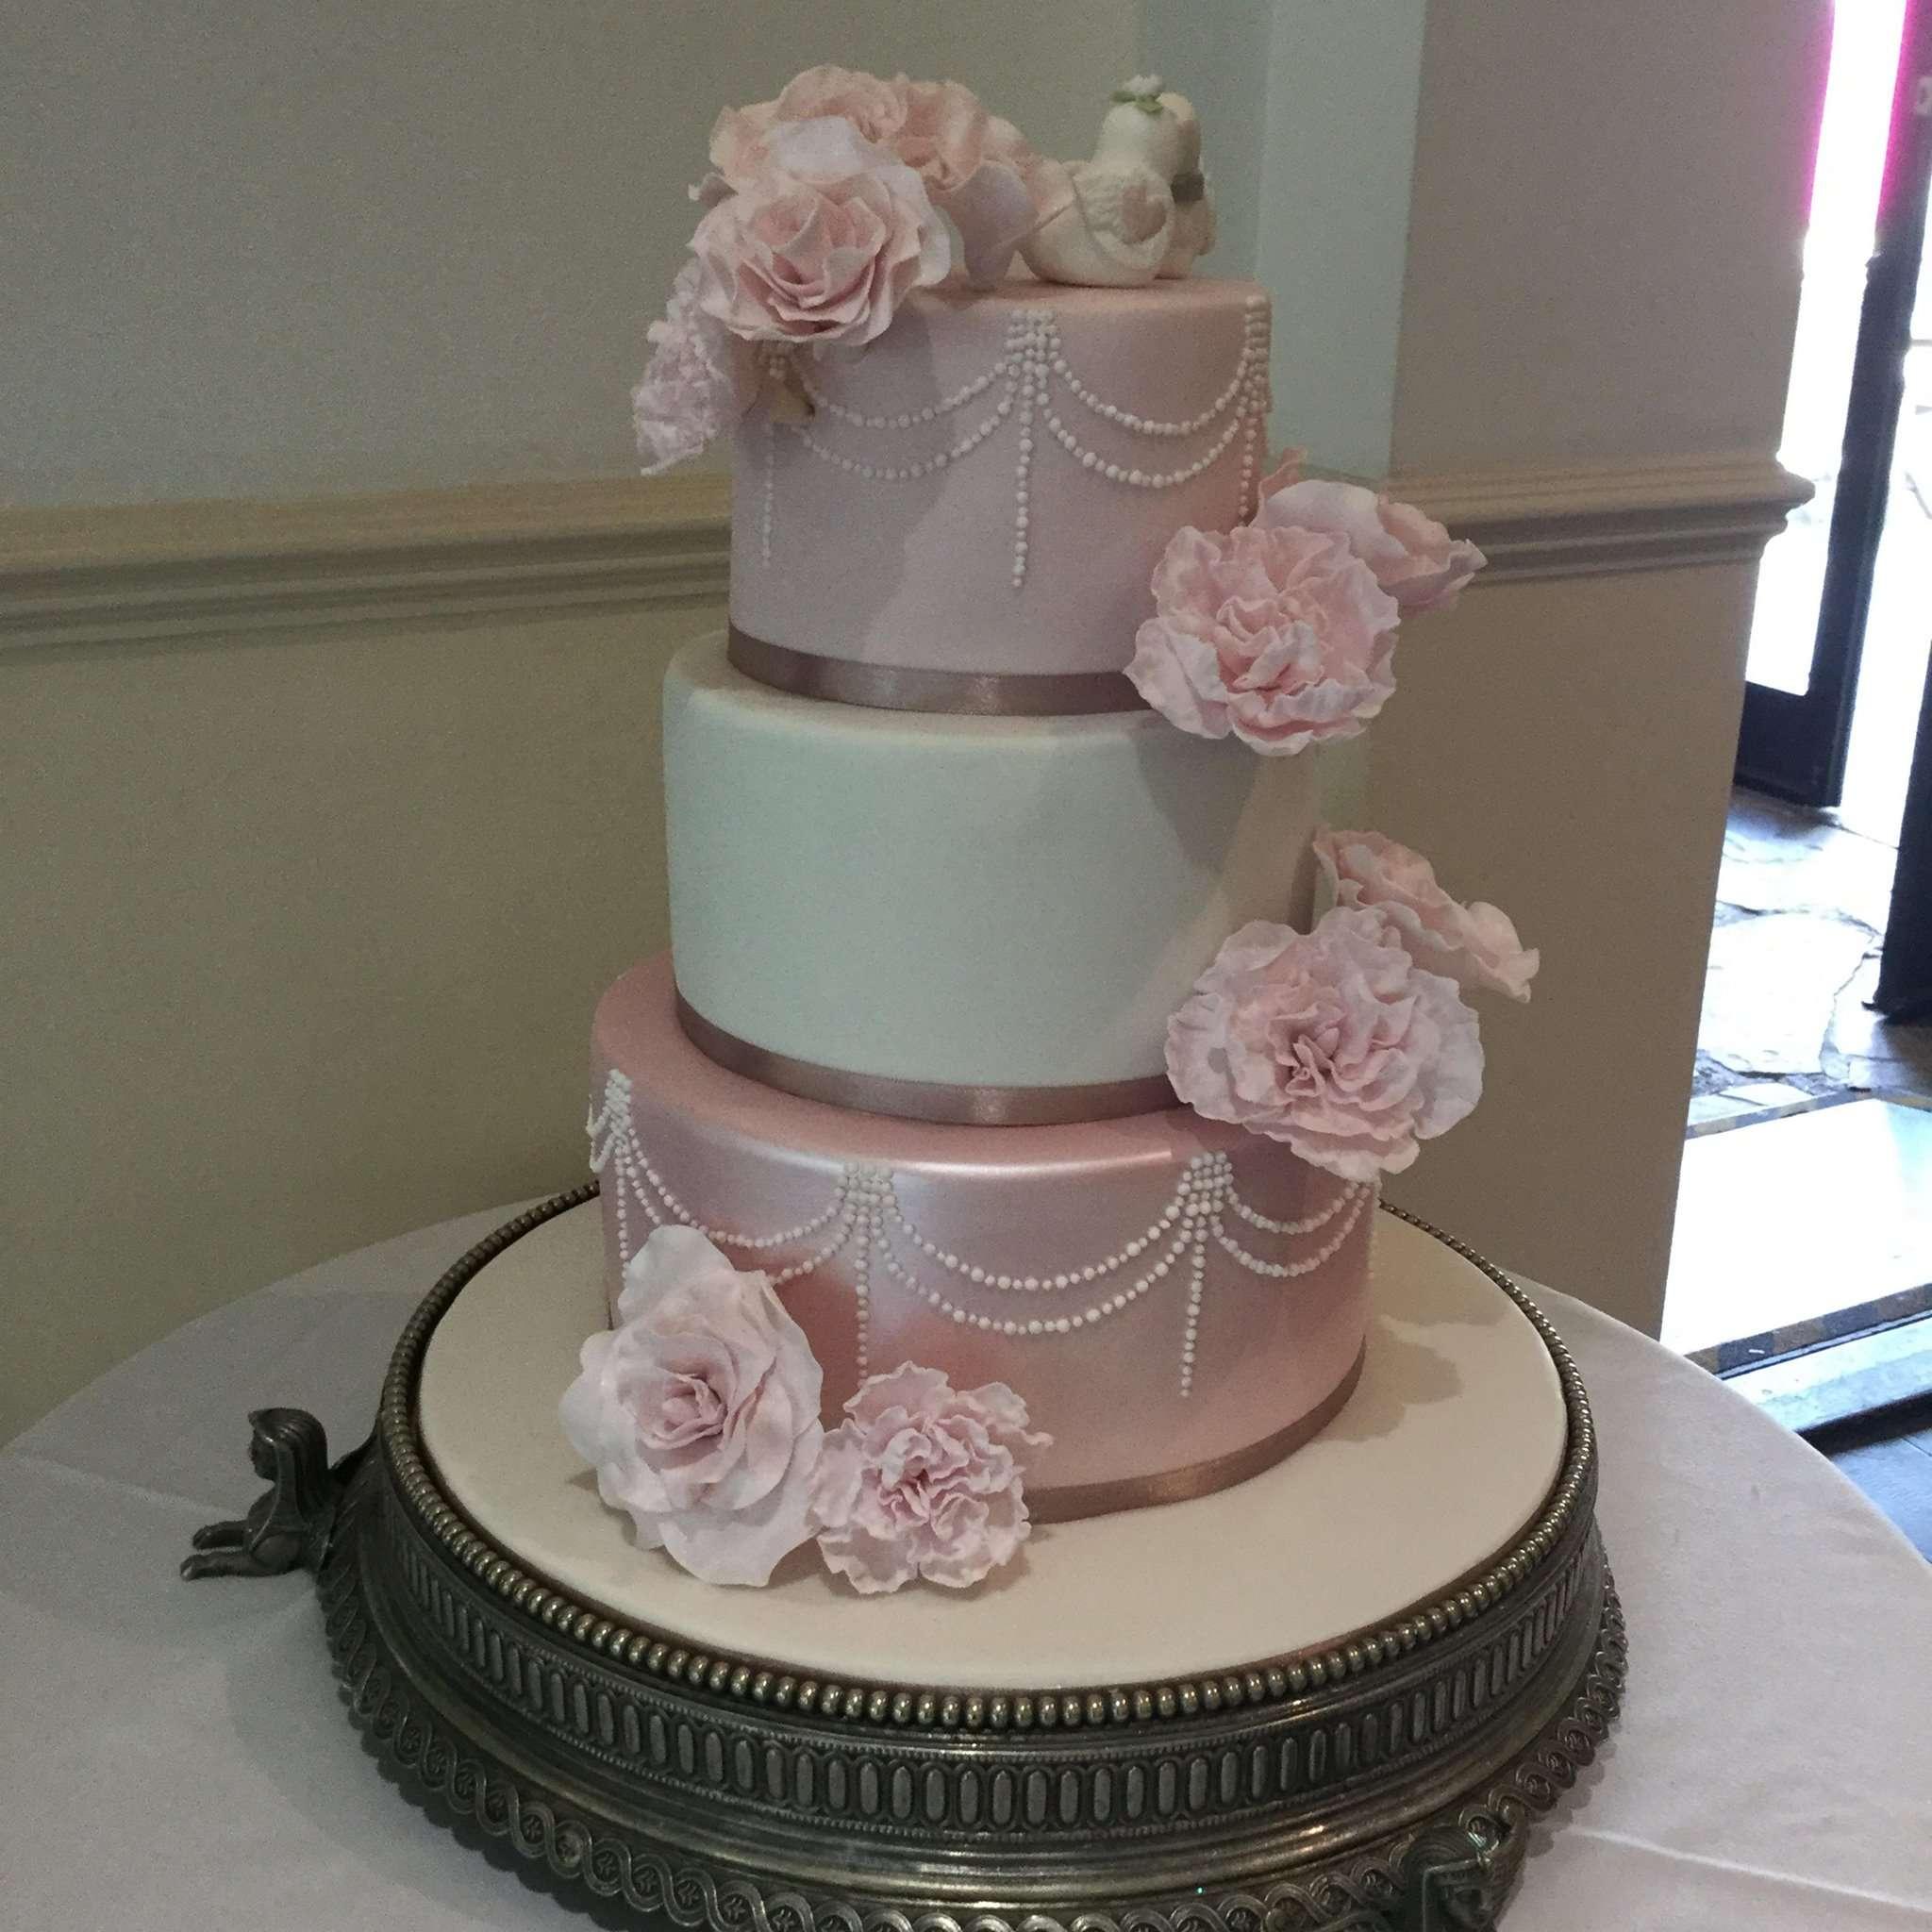 B's Cake Creations